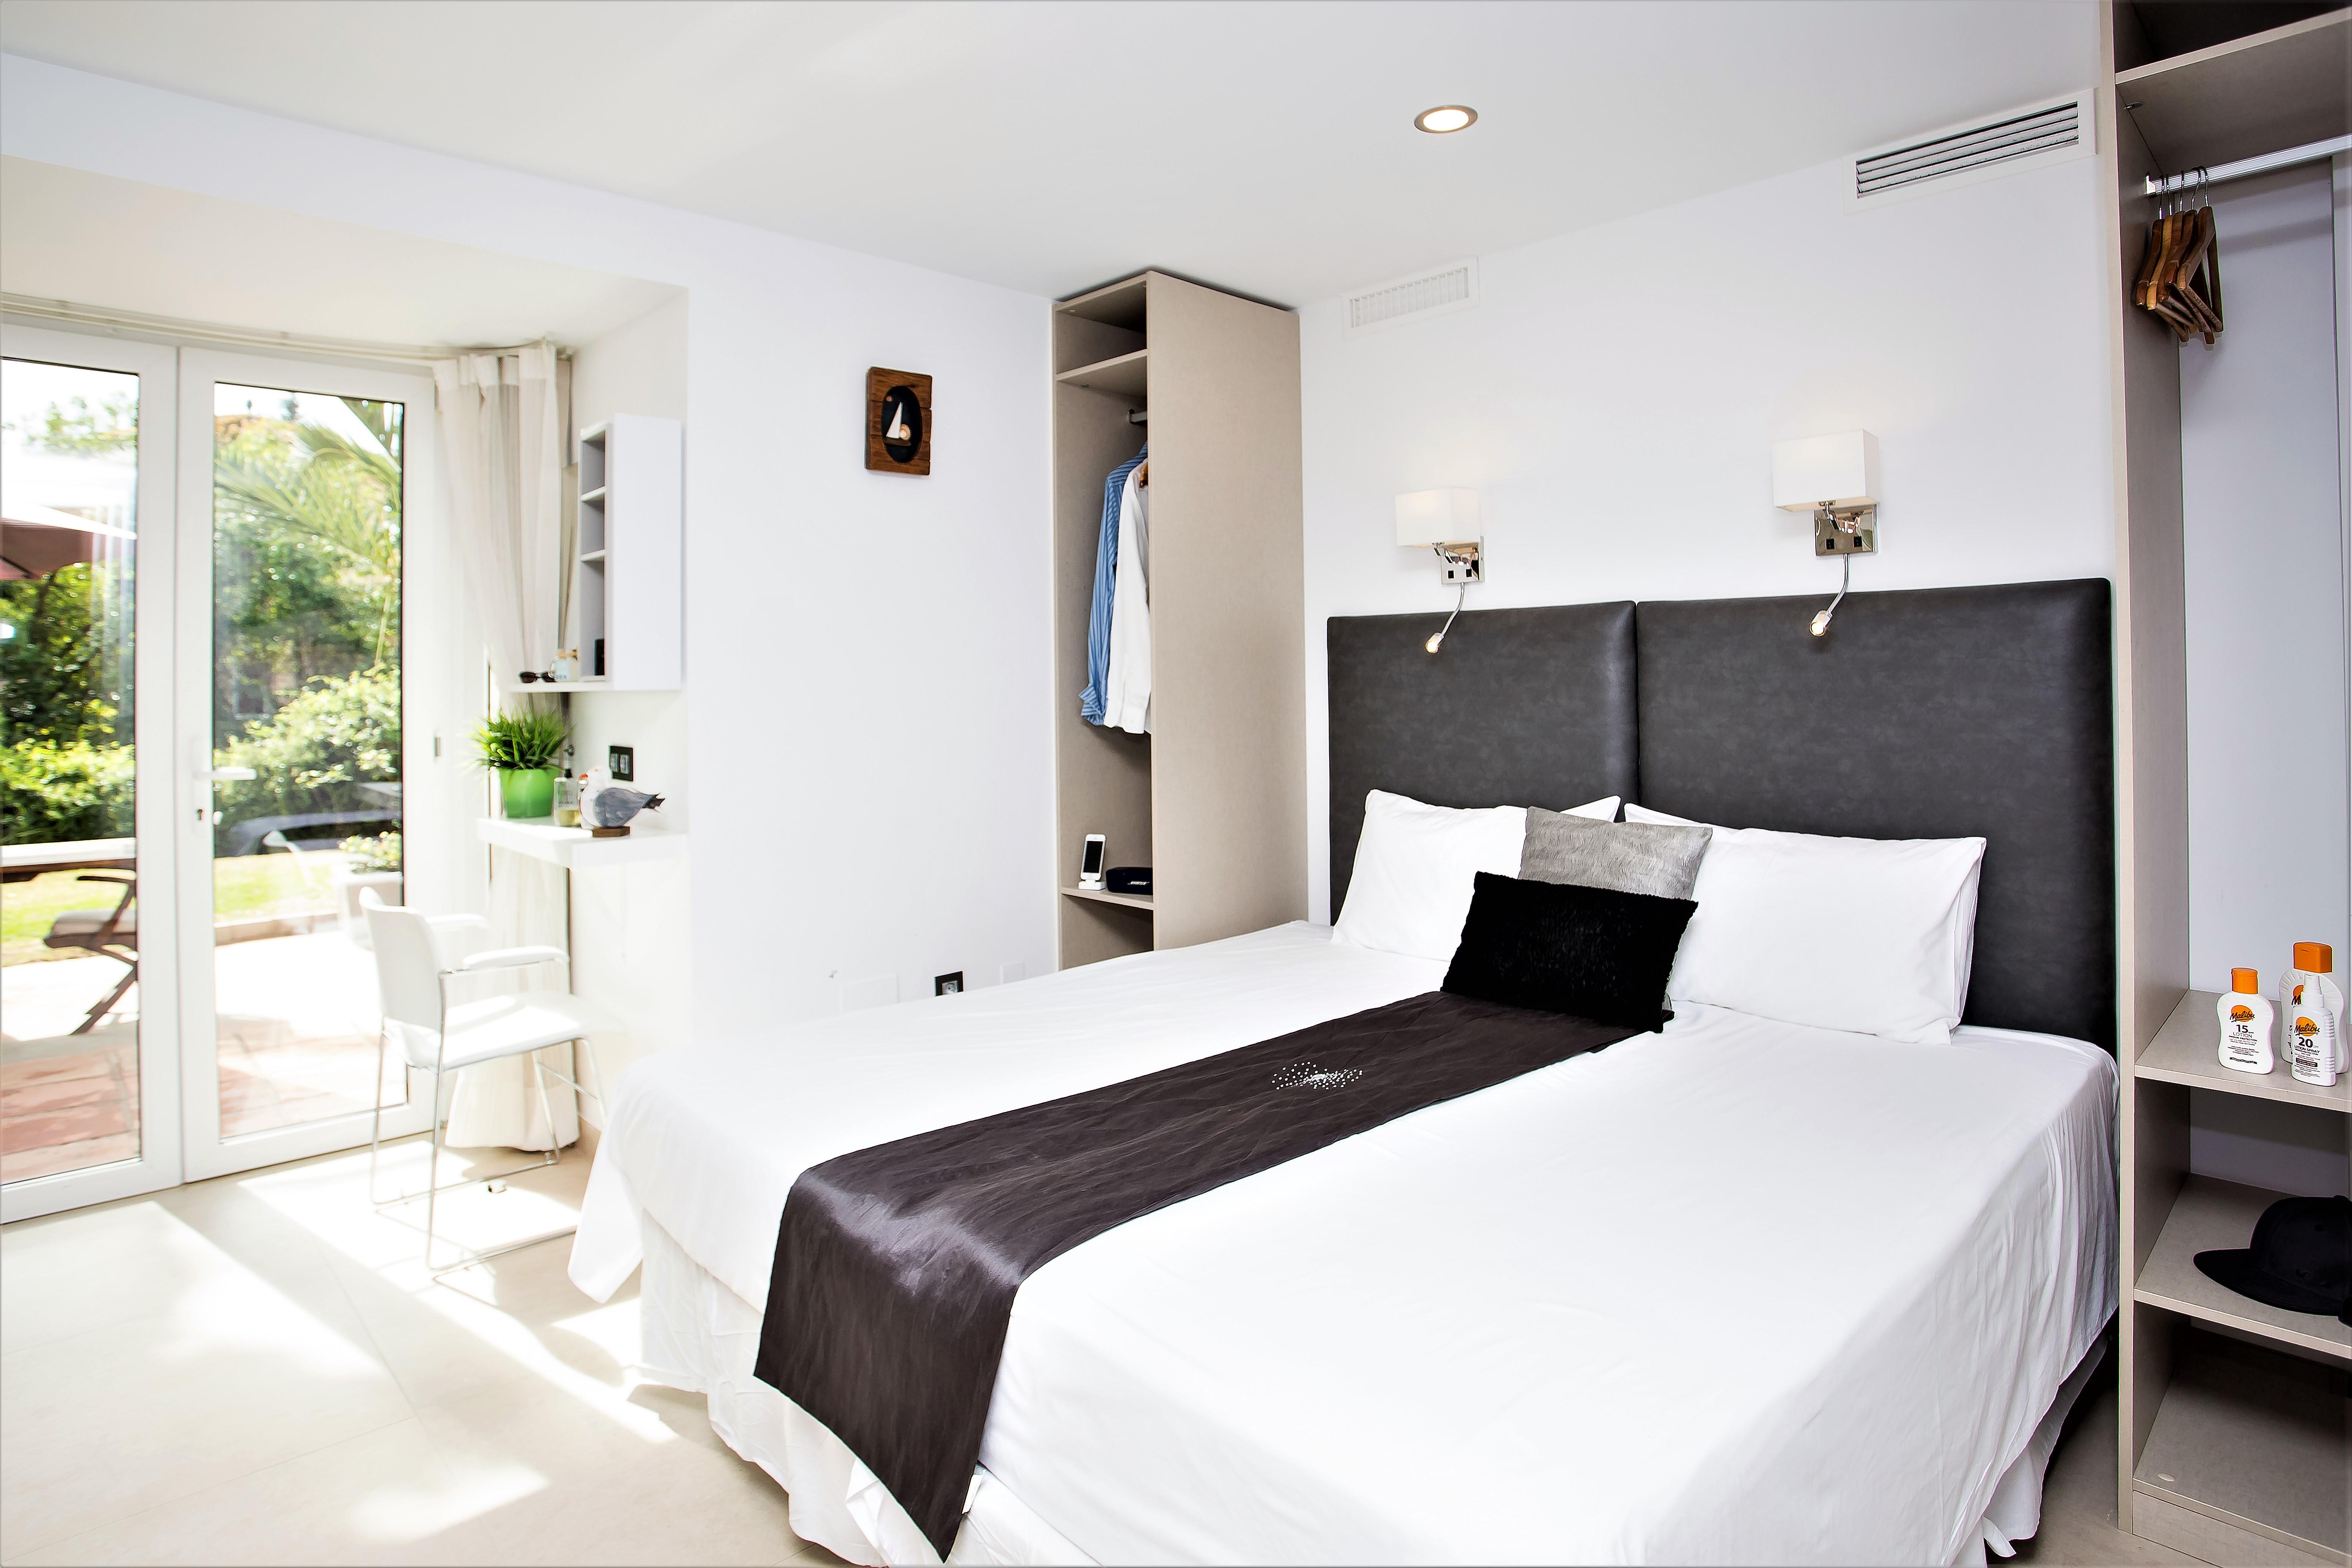 Apartment 4 B R  VILLA by Puerto Banus   Sea 5 m                                photo 20433350